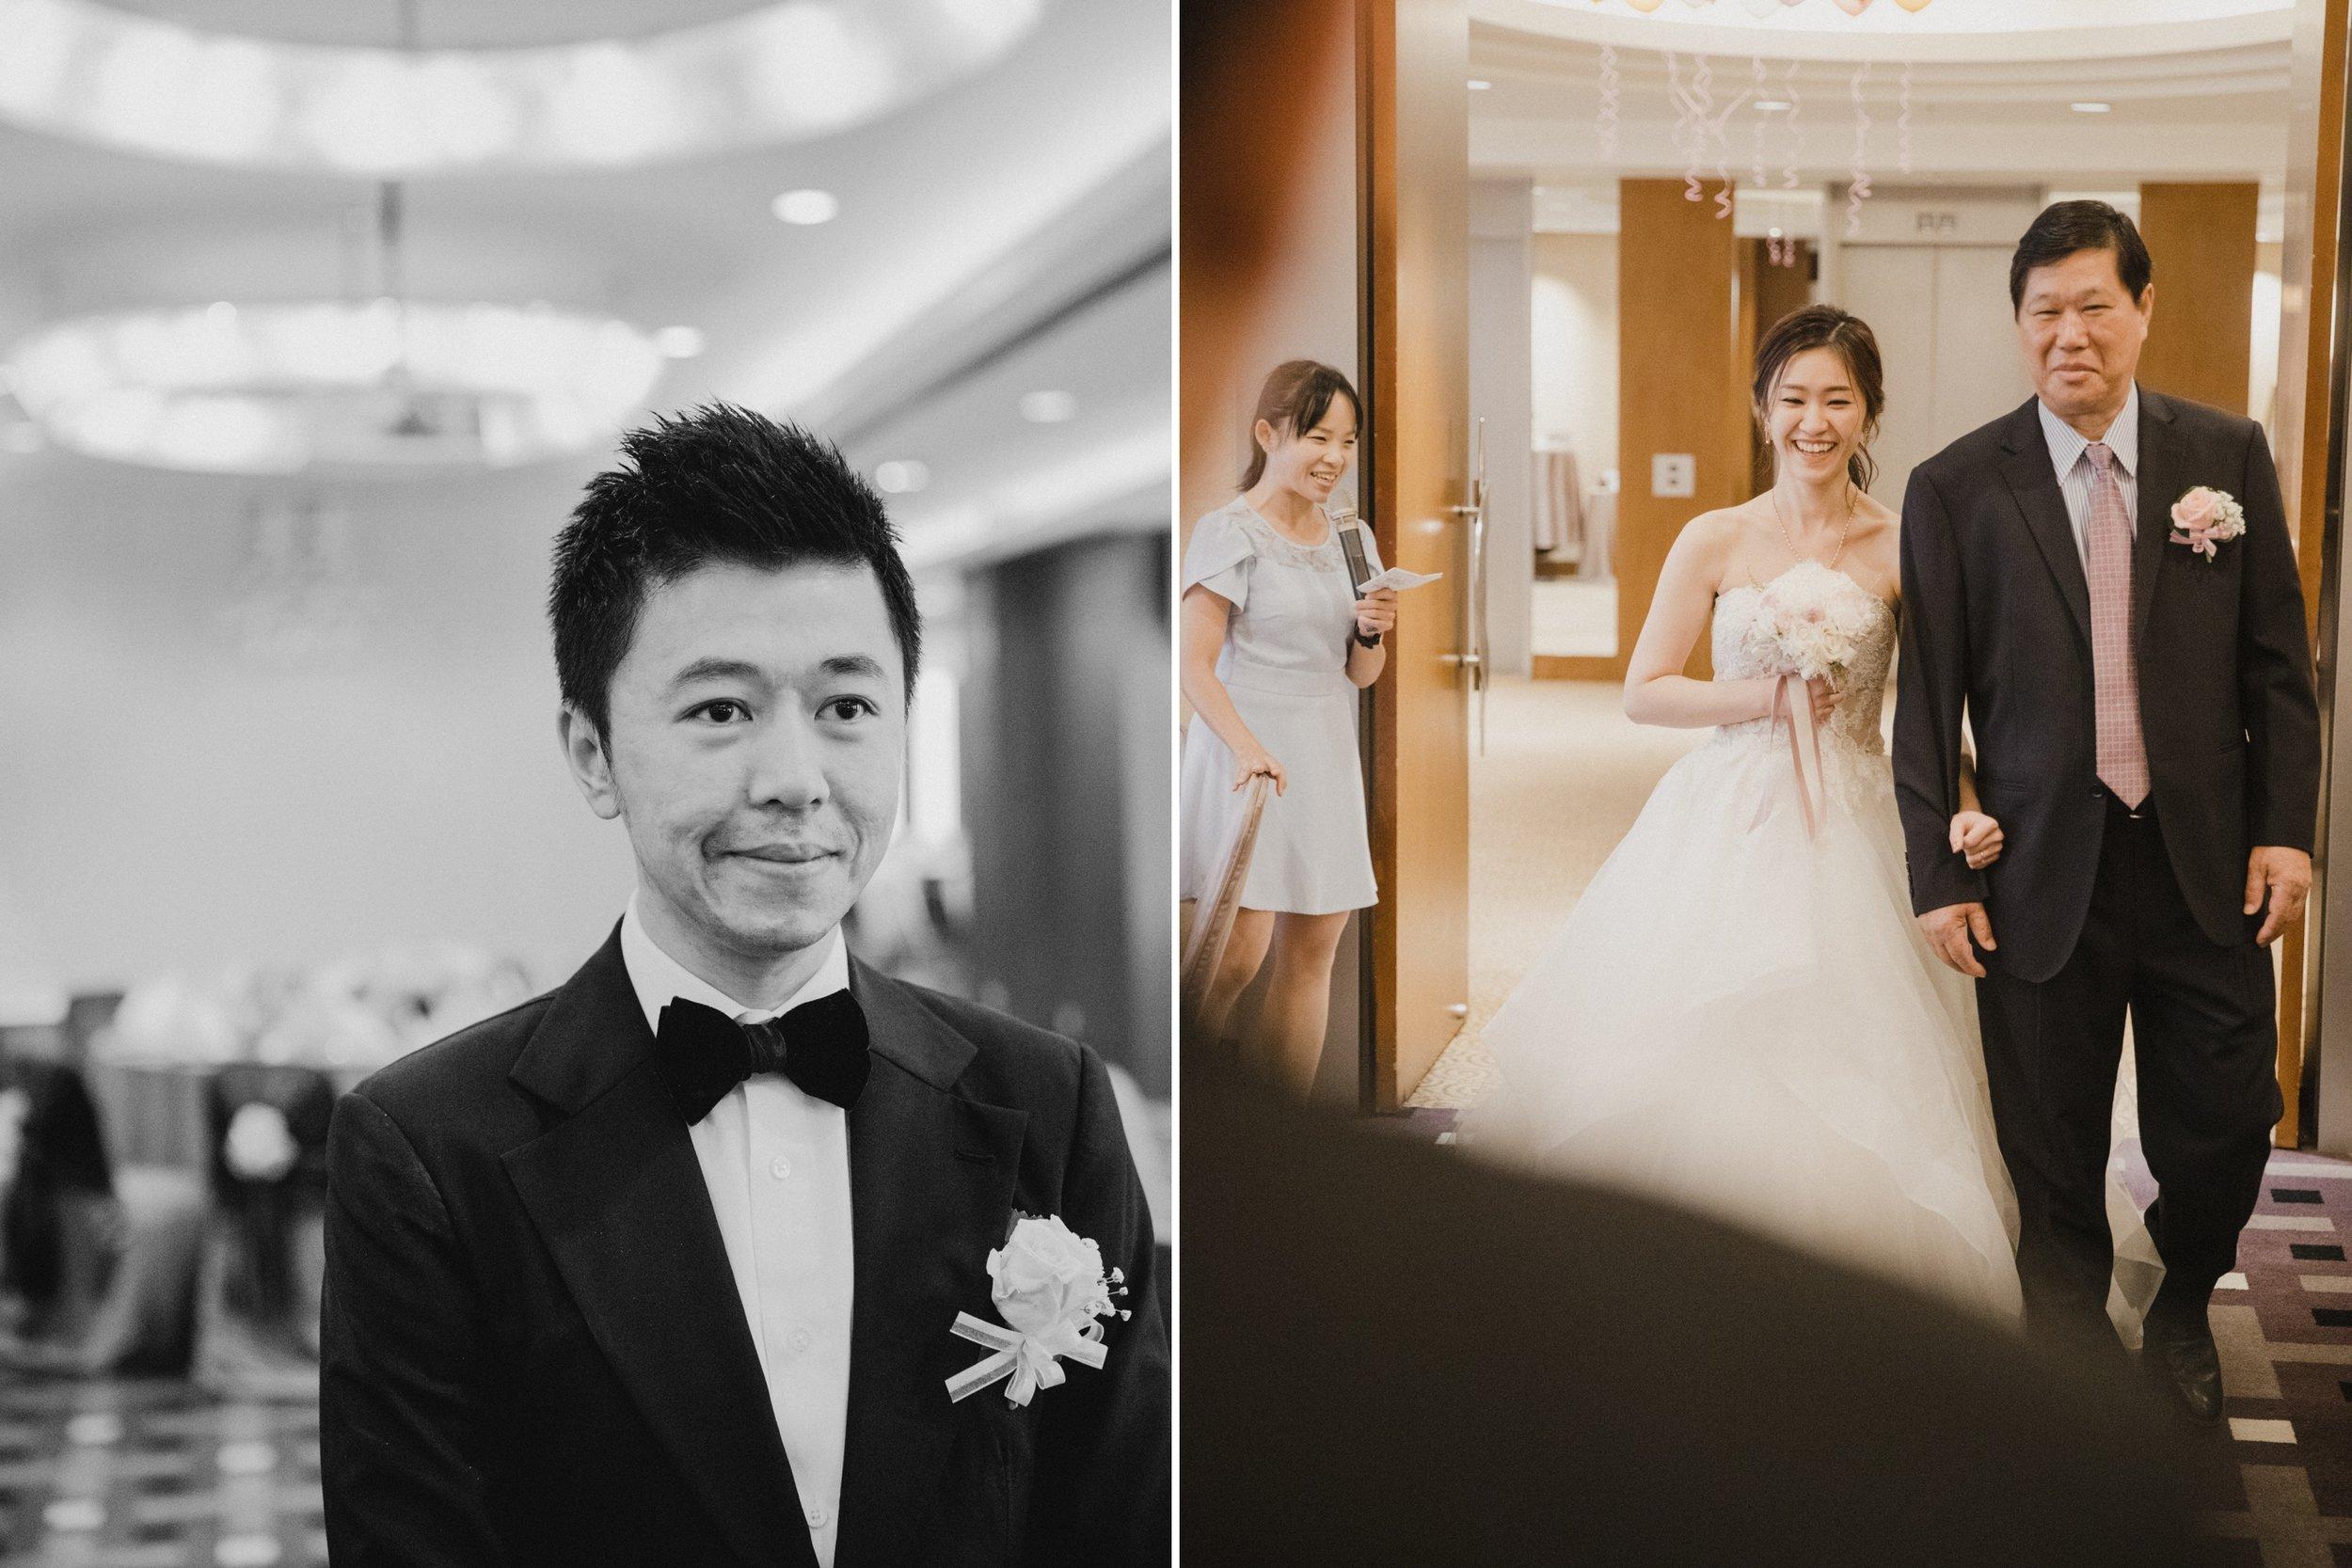 wedding-caridee-oscar-lunch-ambassador-hsinchu-結婚午宴-新竹國賓_34.jpg